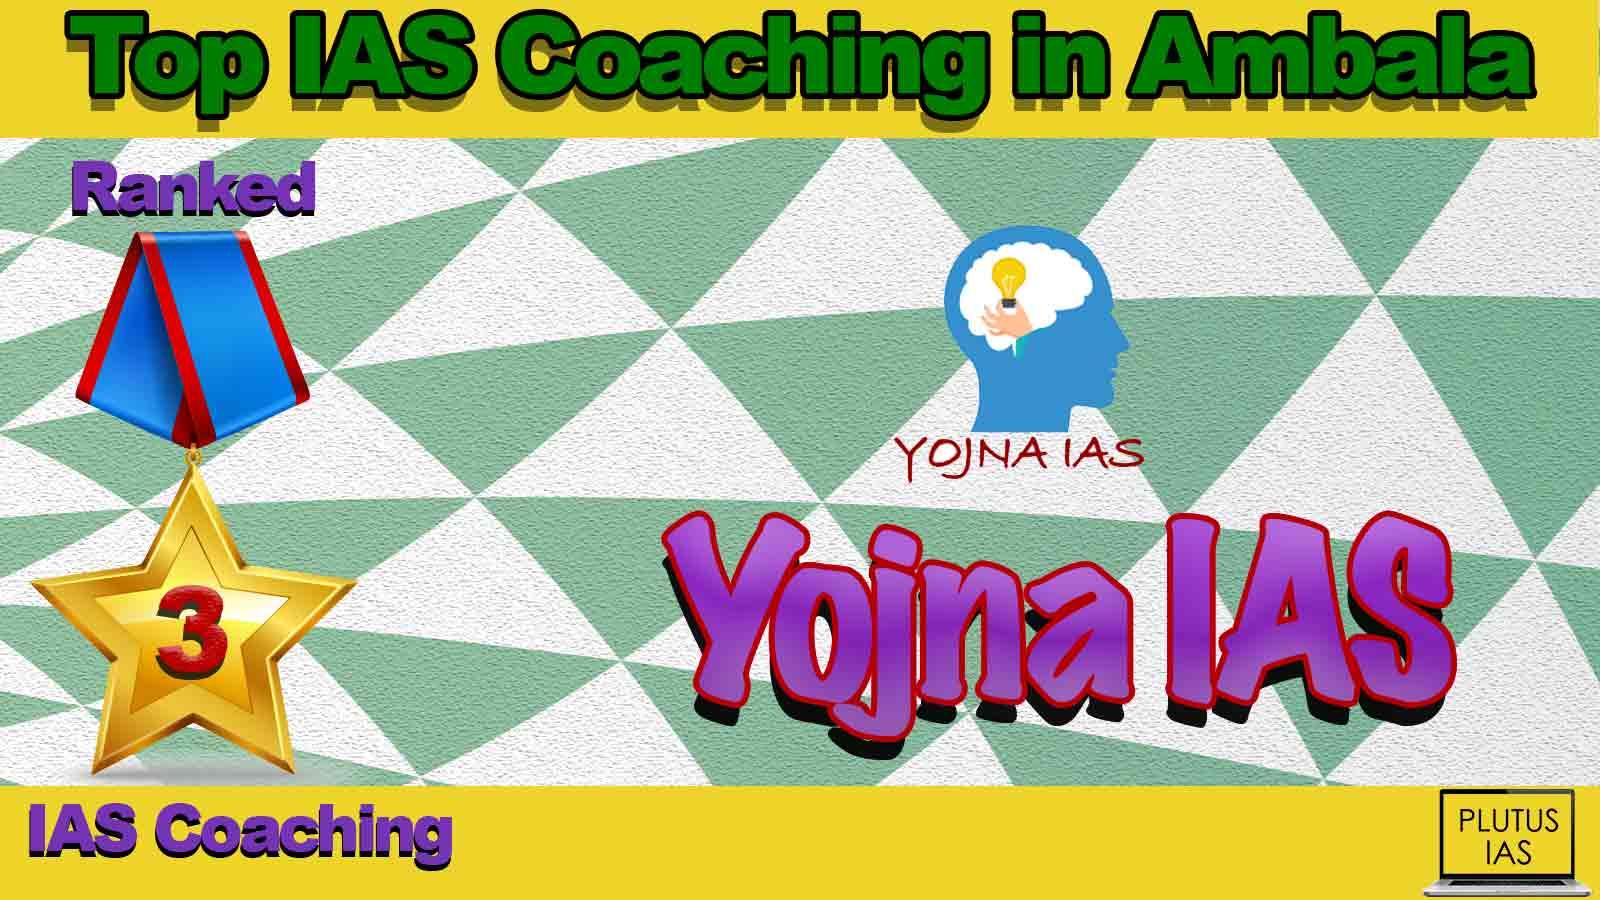 Best IAS Coaching in Ambala